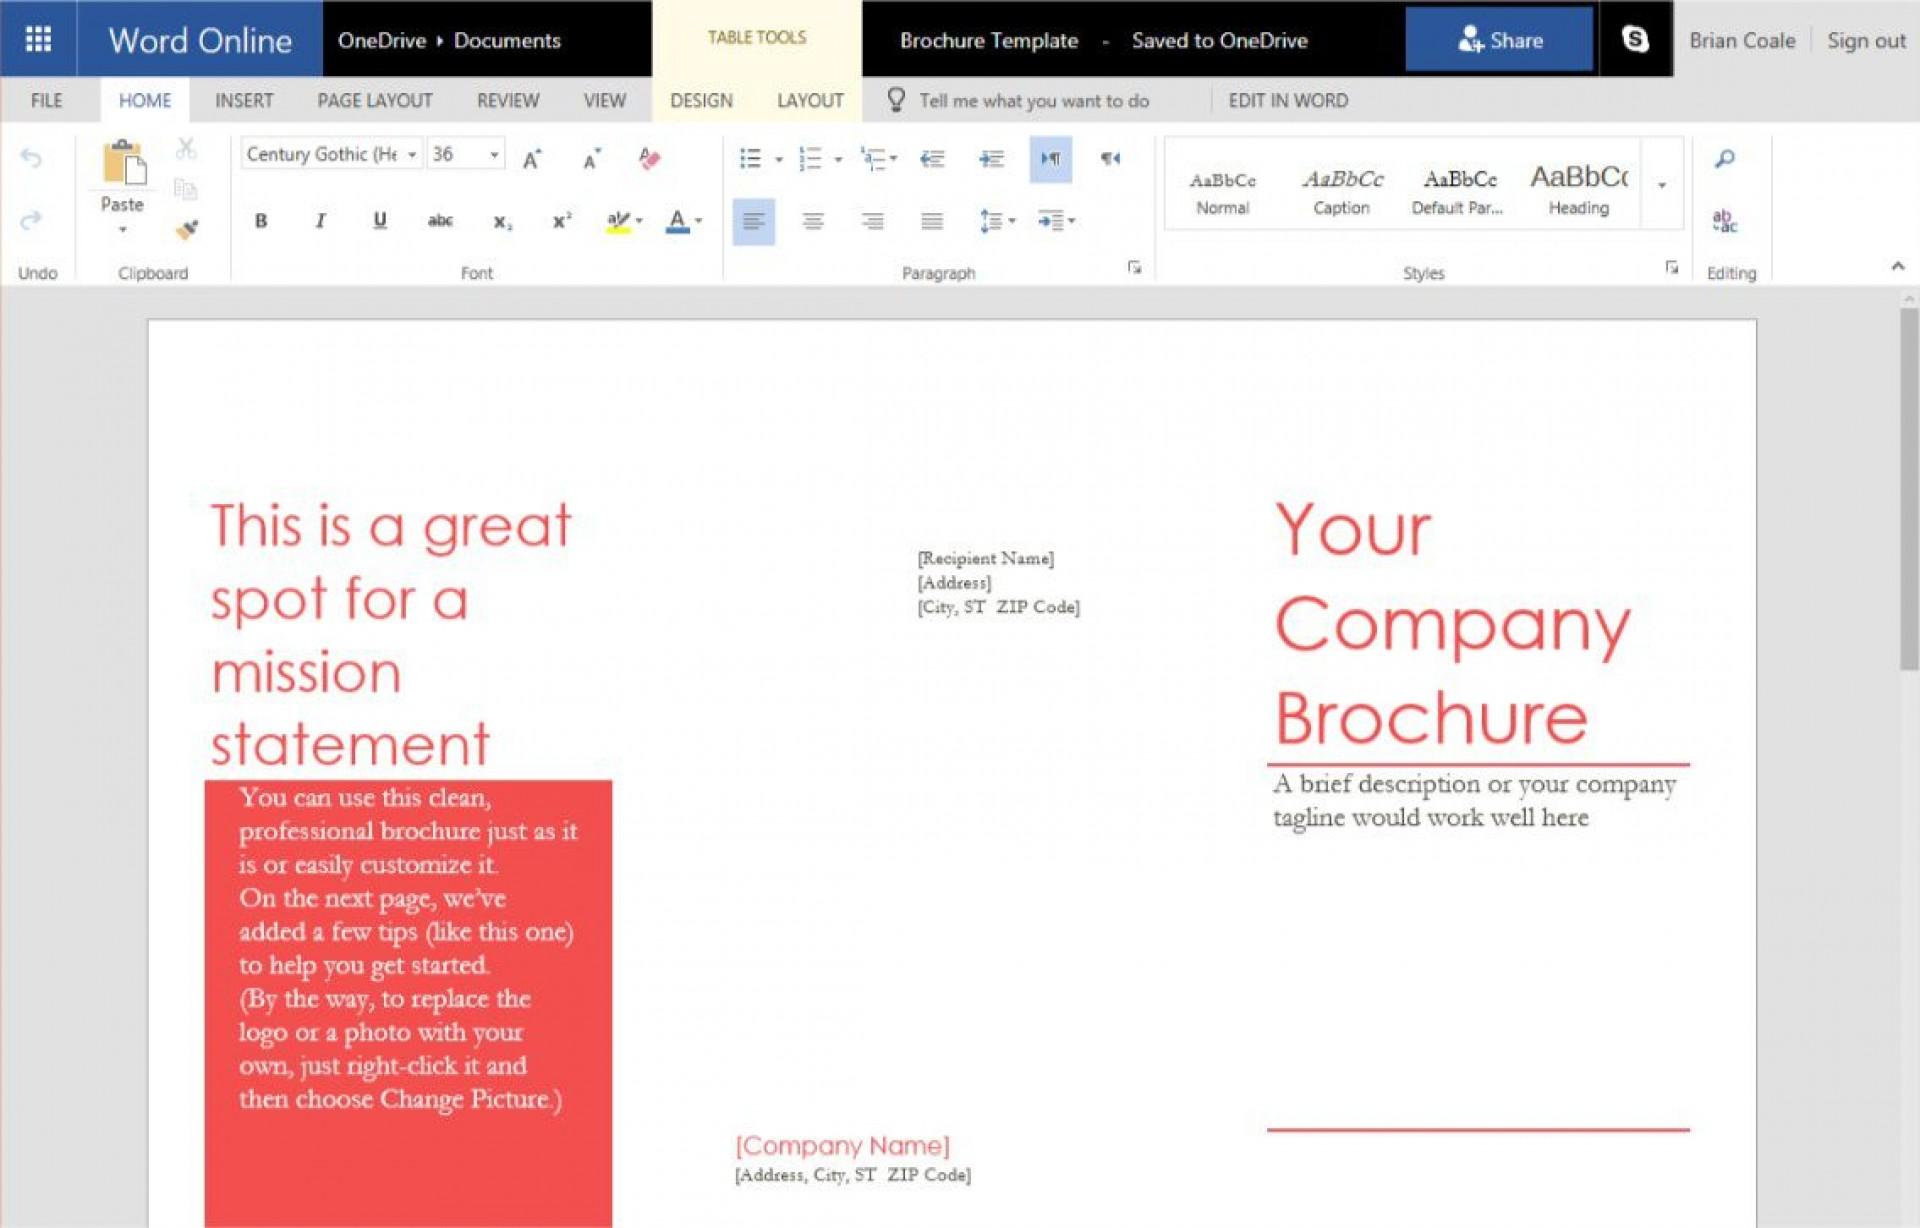 007 Stirring Tri Fold Template Google Doc Idea  Docs Brochure Free Pamphlet Blank Slide1920